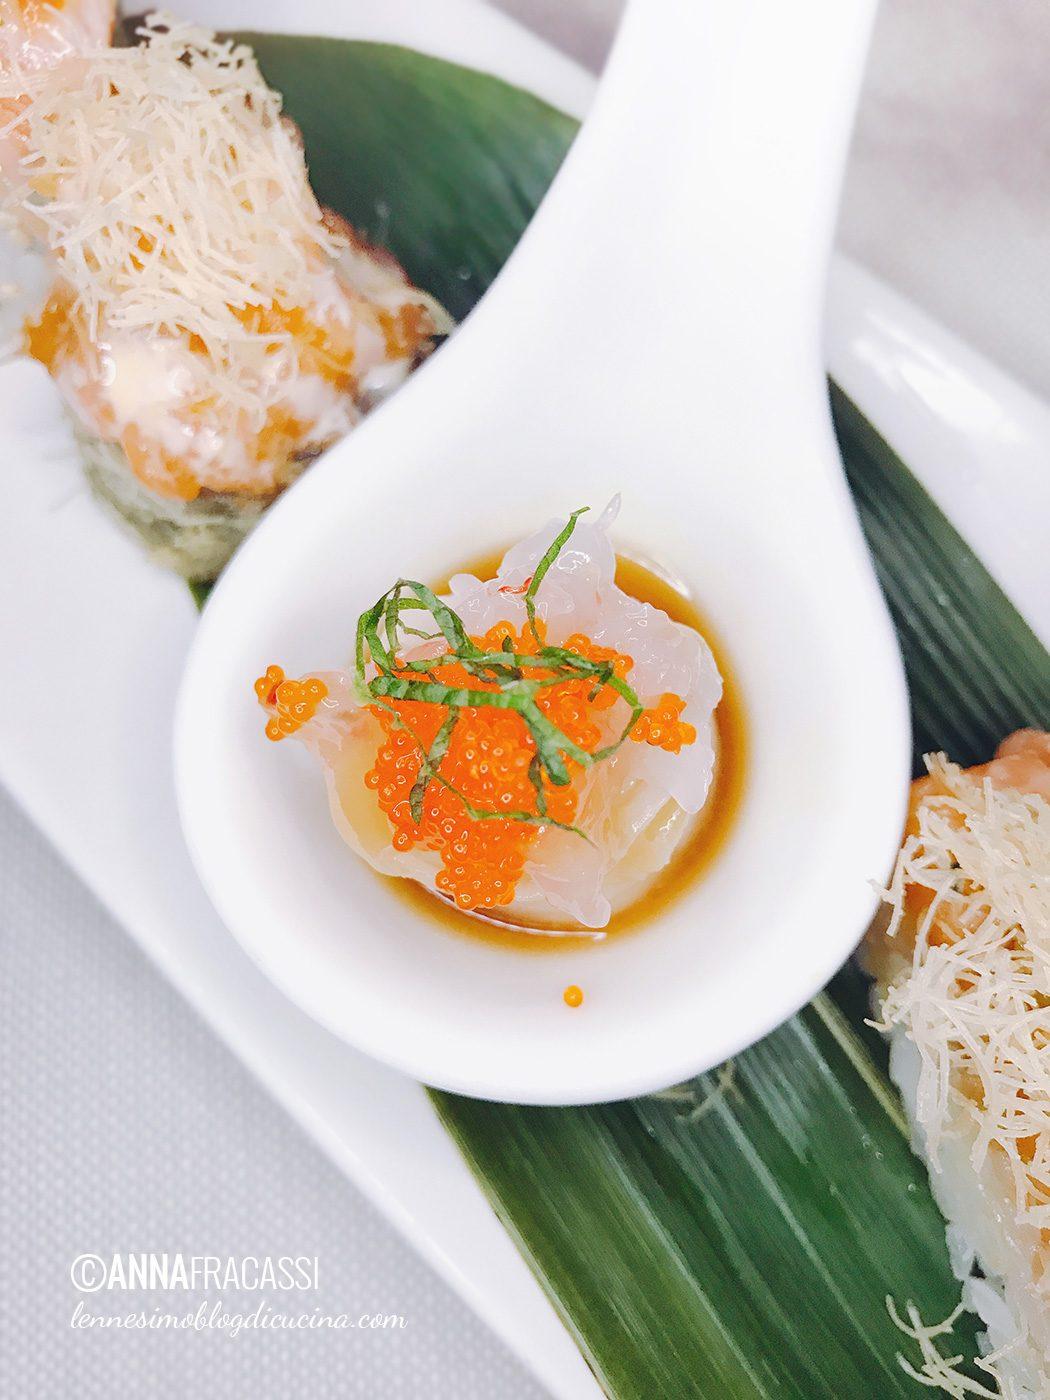 Ristorante MU fish: oriental taste